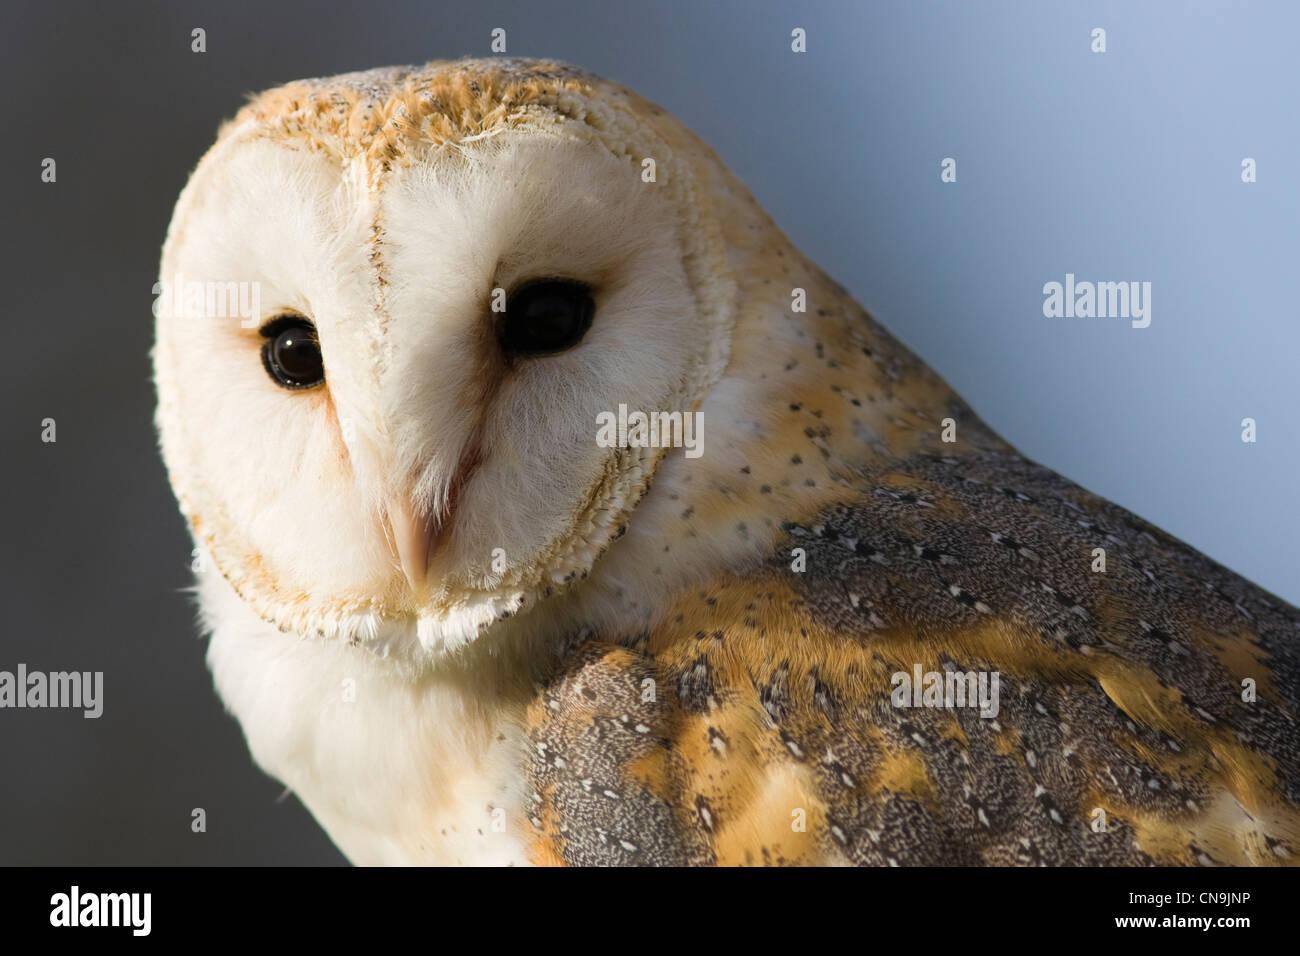 Close up portrait of a Barn Owl - Tyto alba Stock Photo